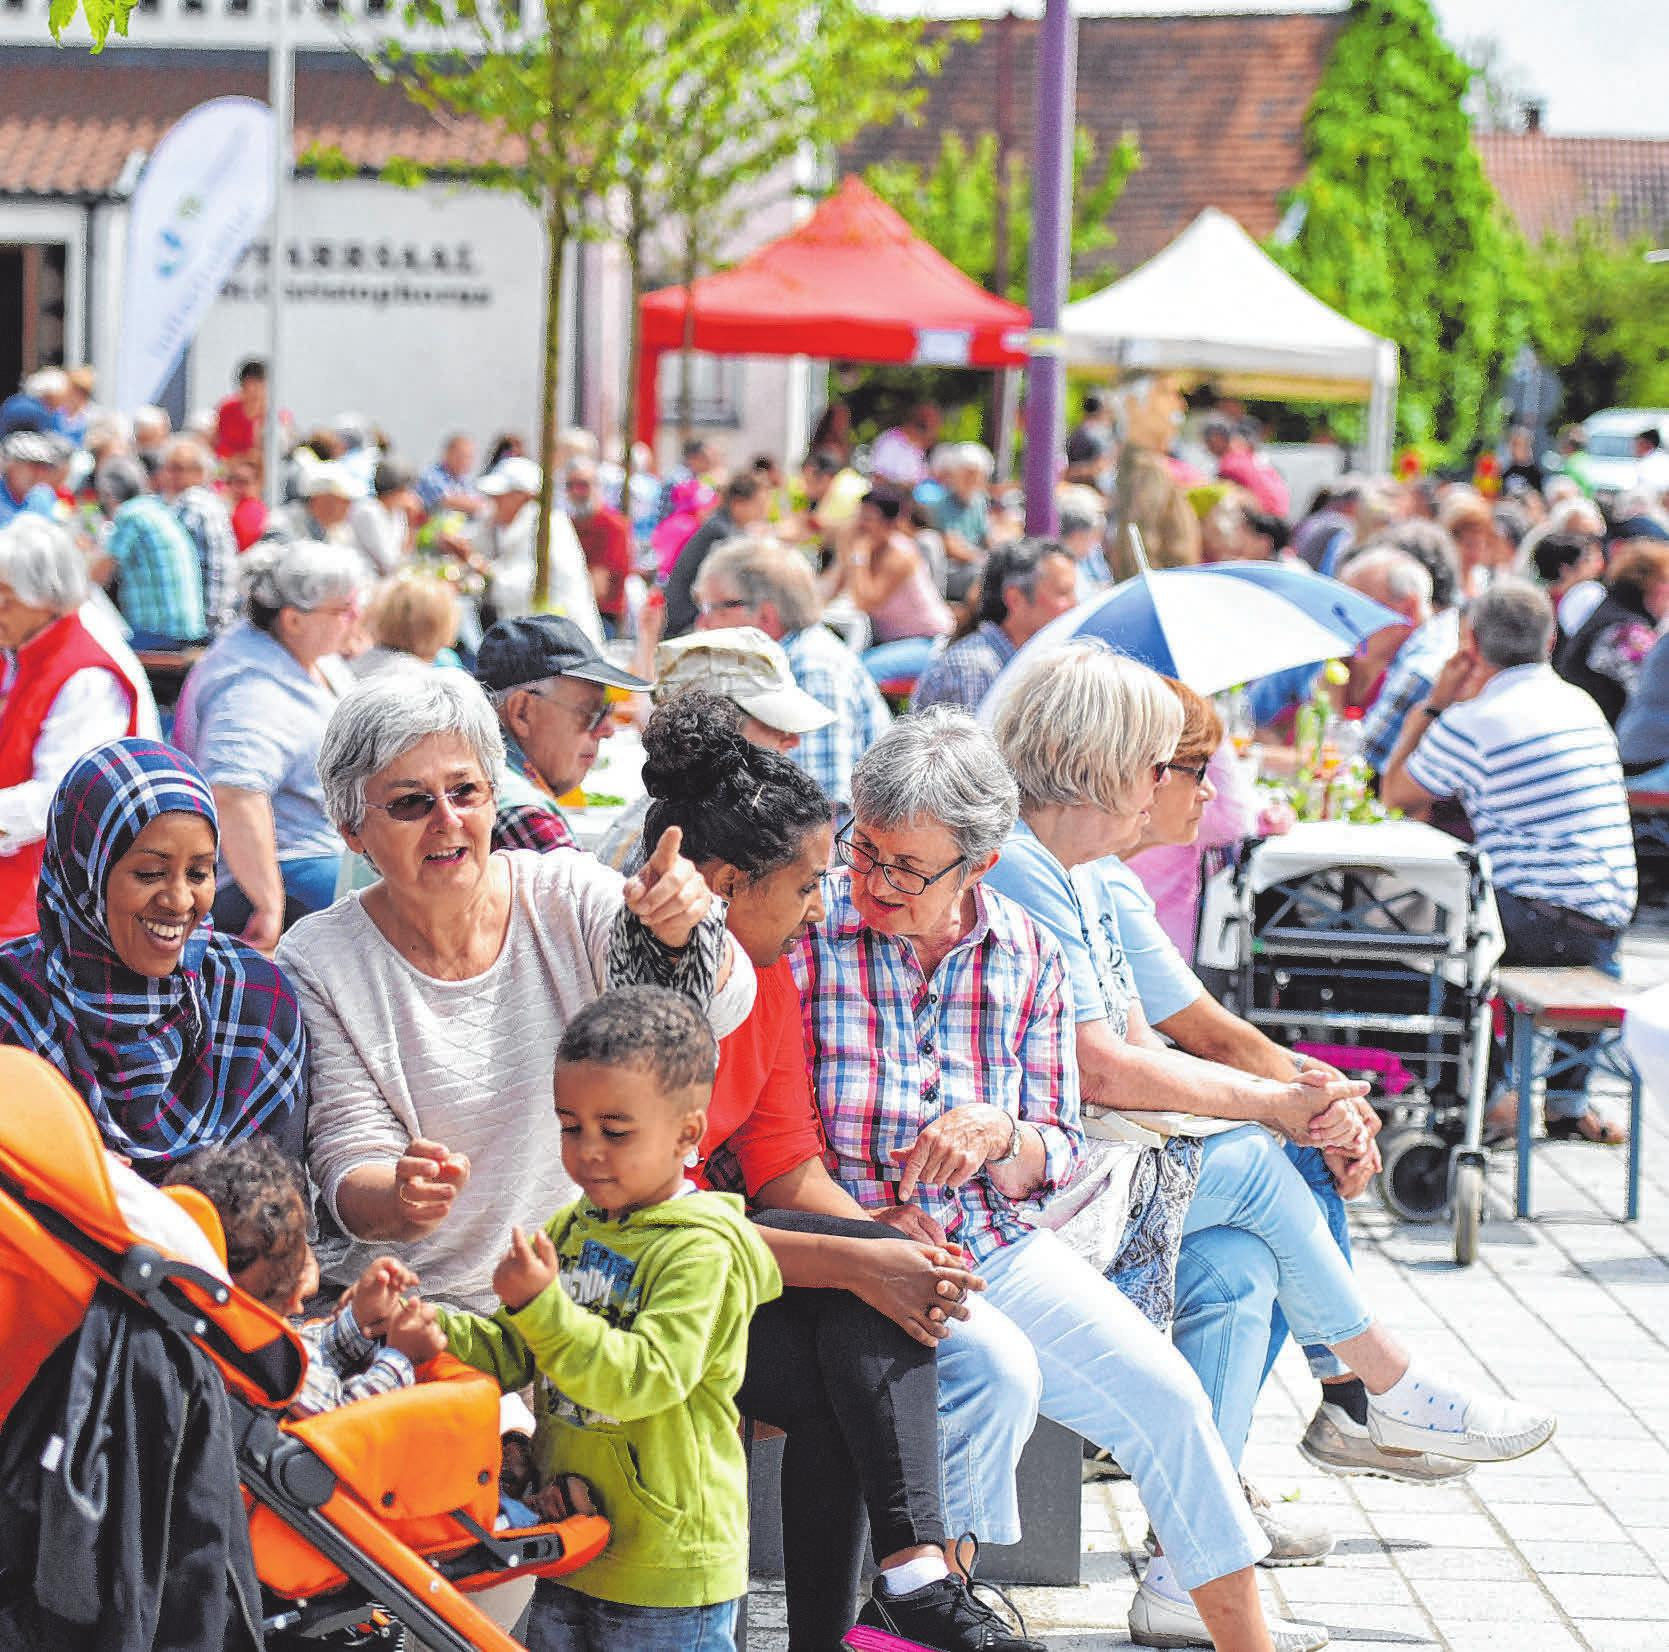 Feiern am Stachus in Nonnenhorn Image 1